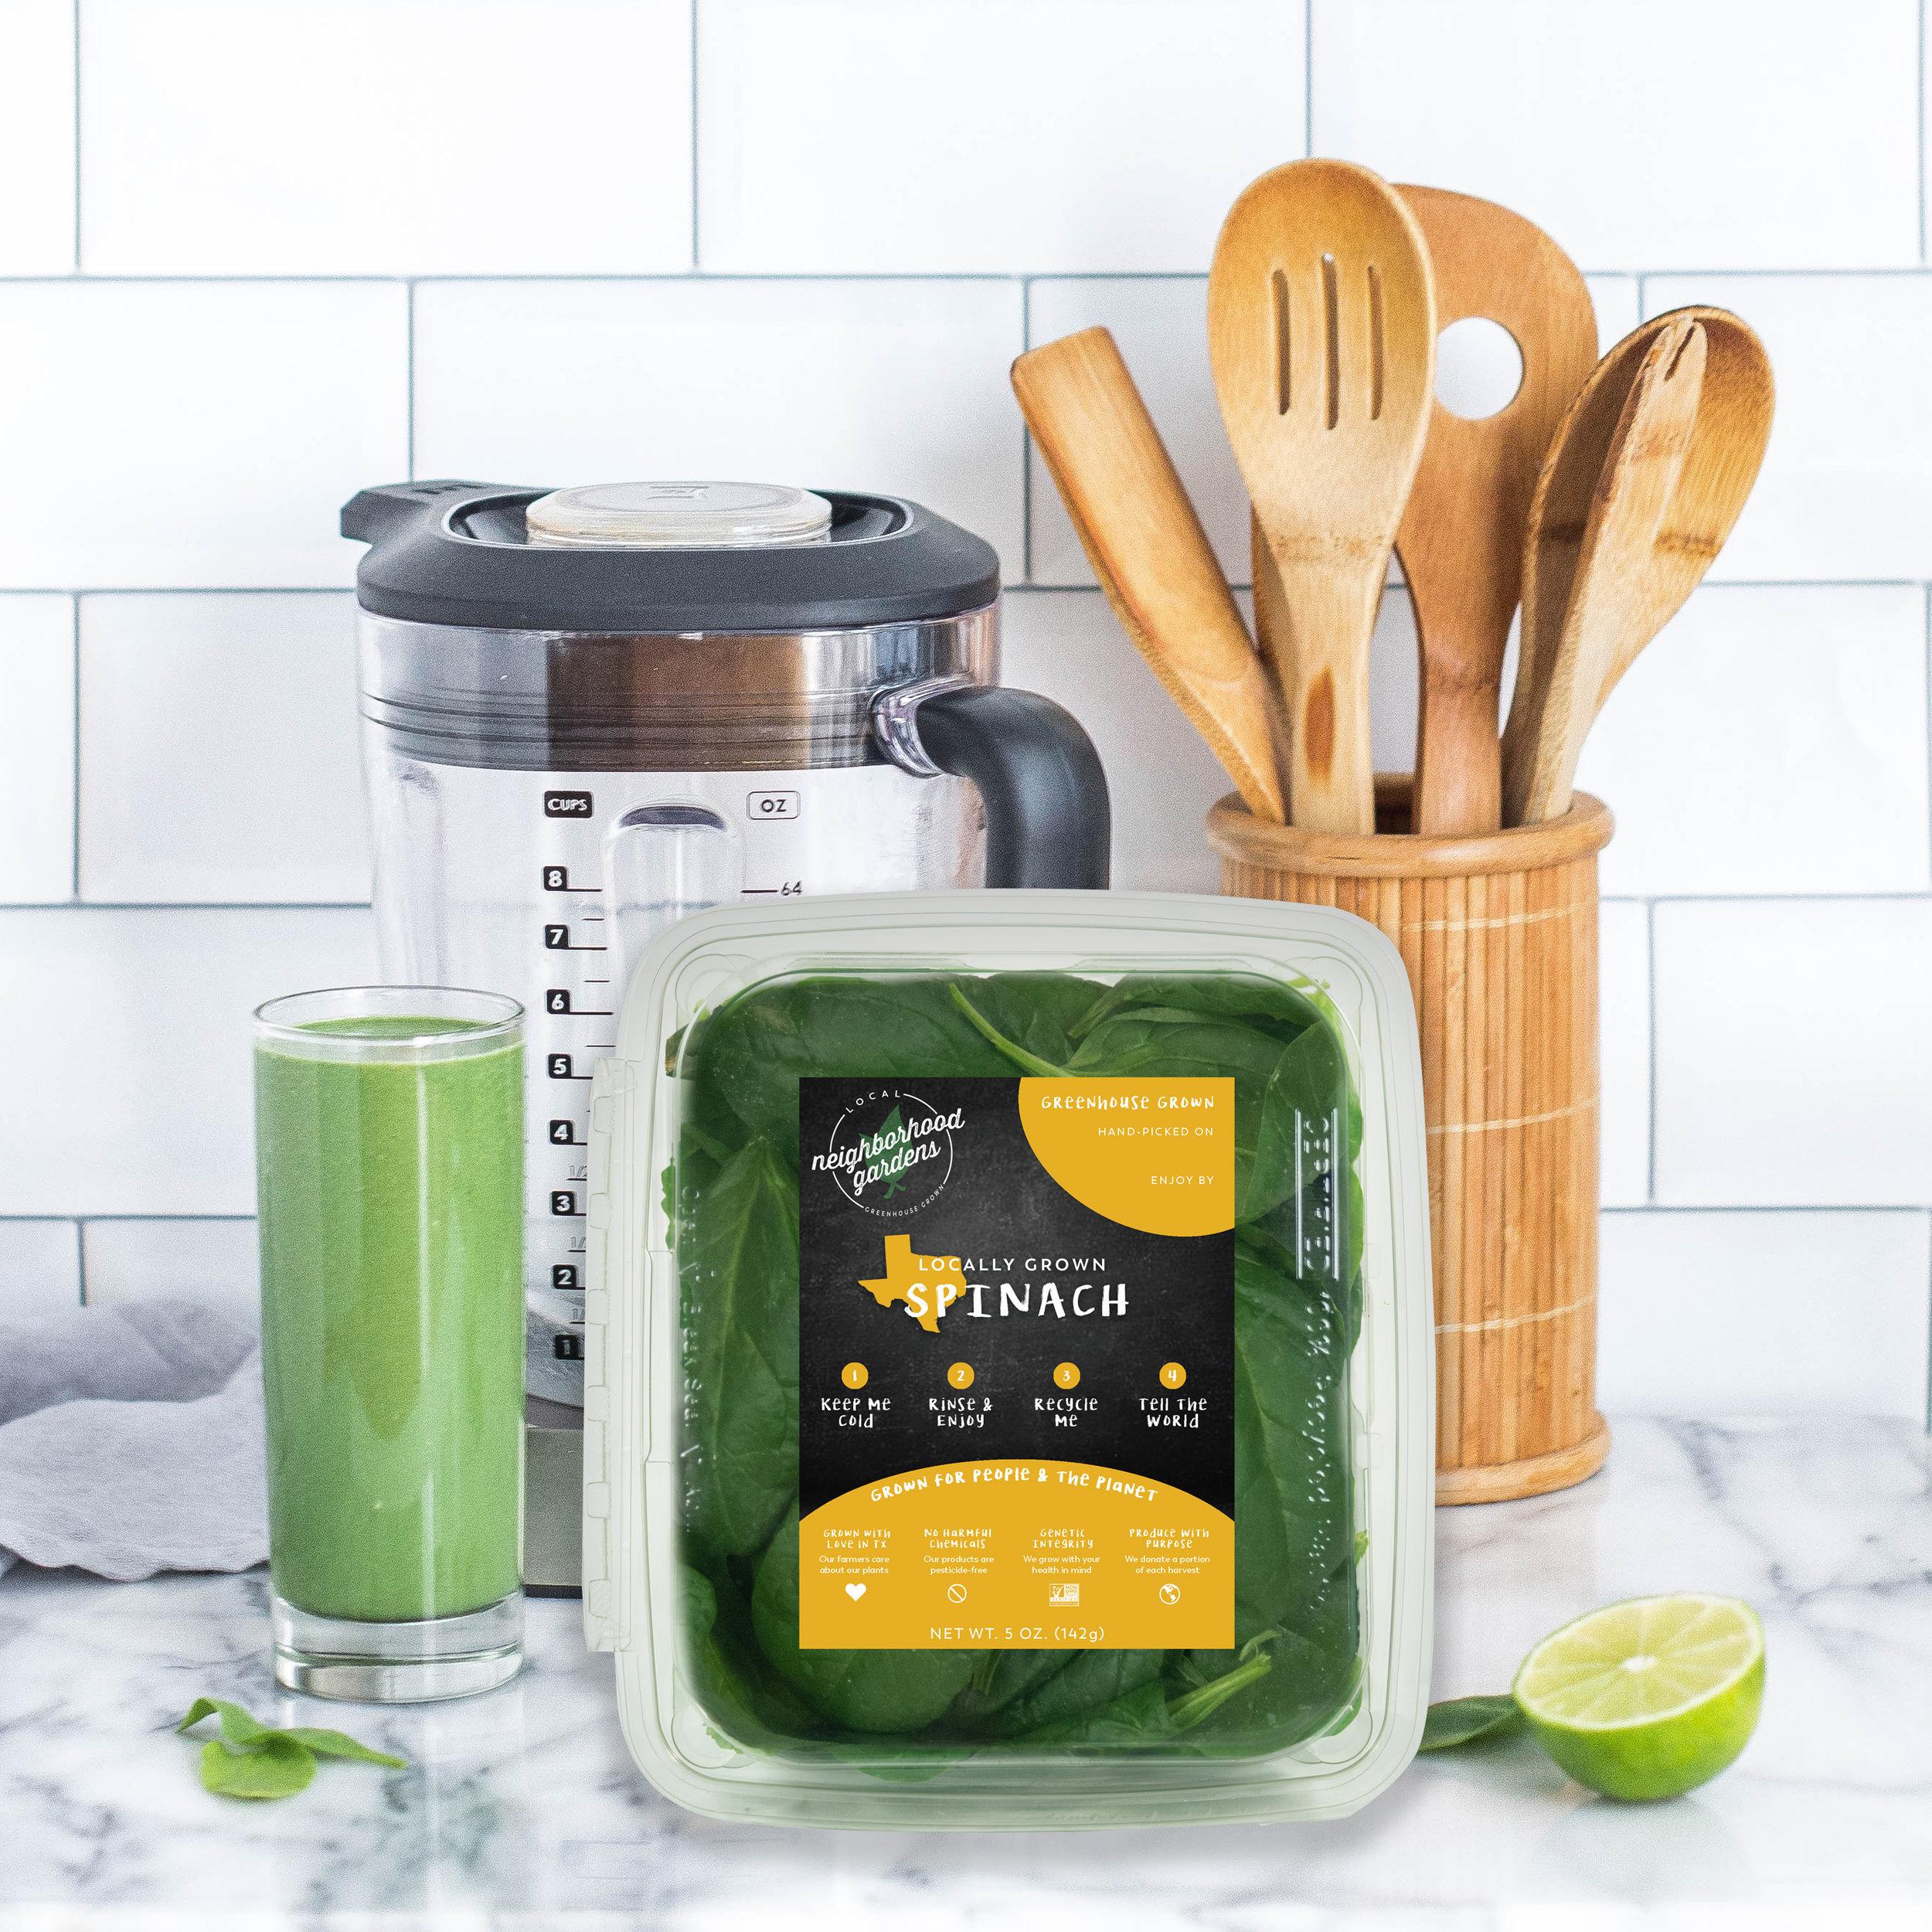 spinach promo 1.jpg